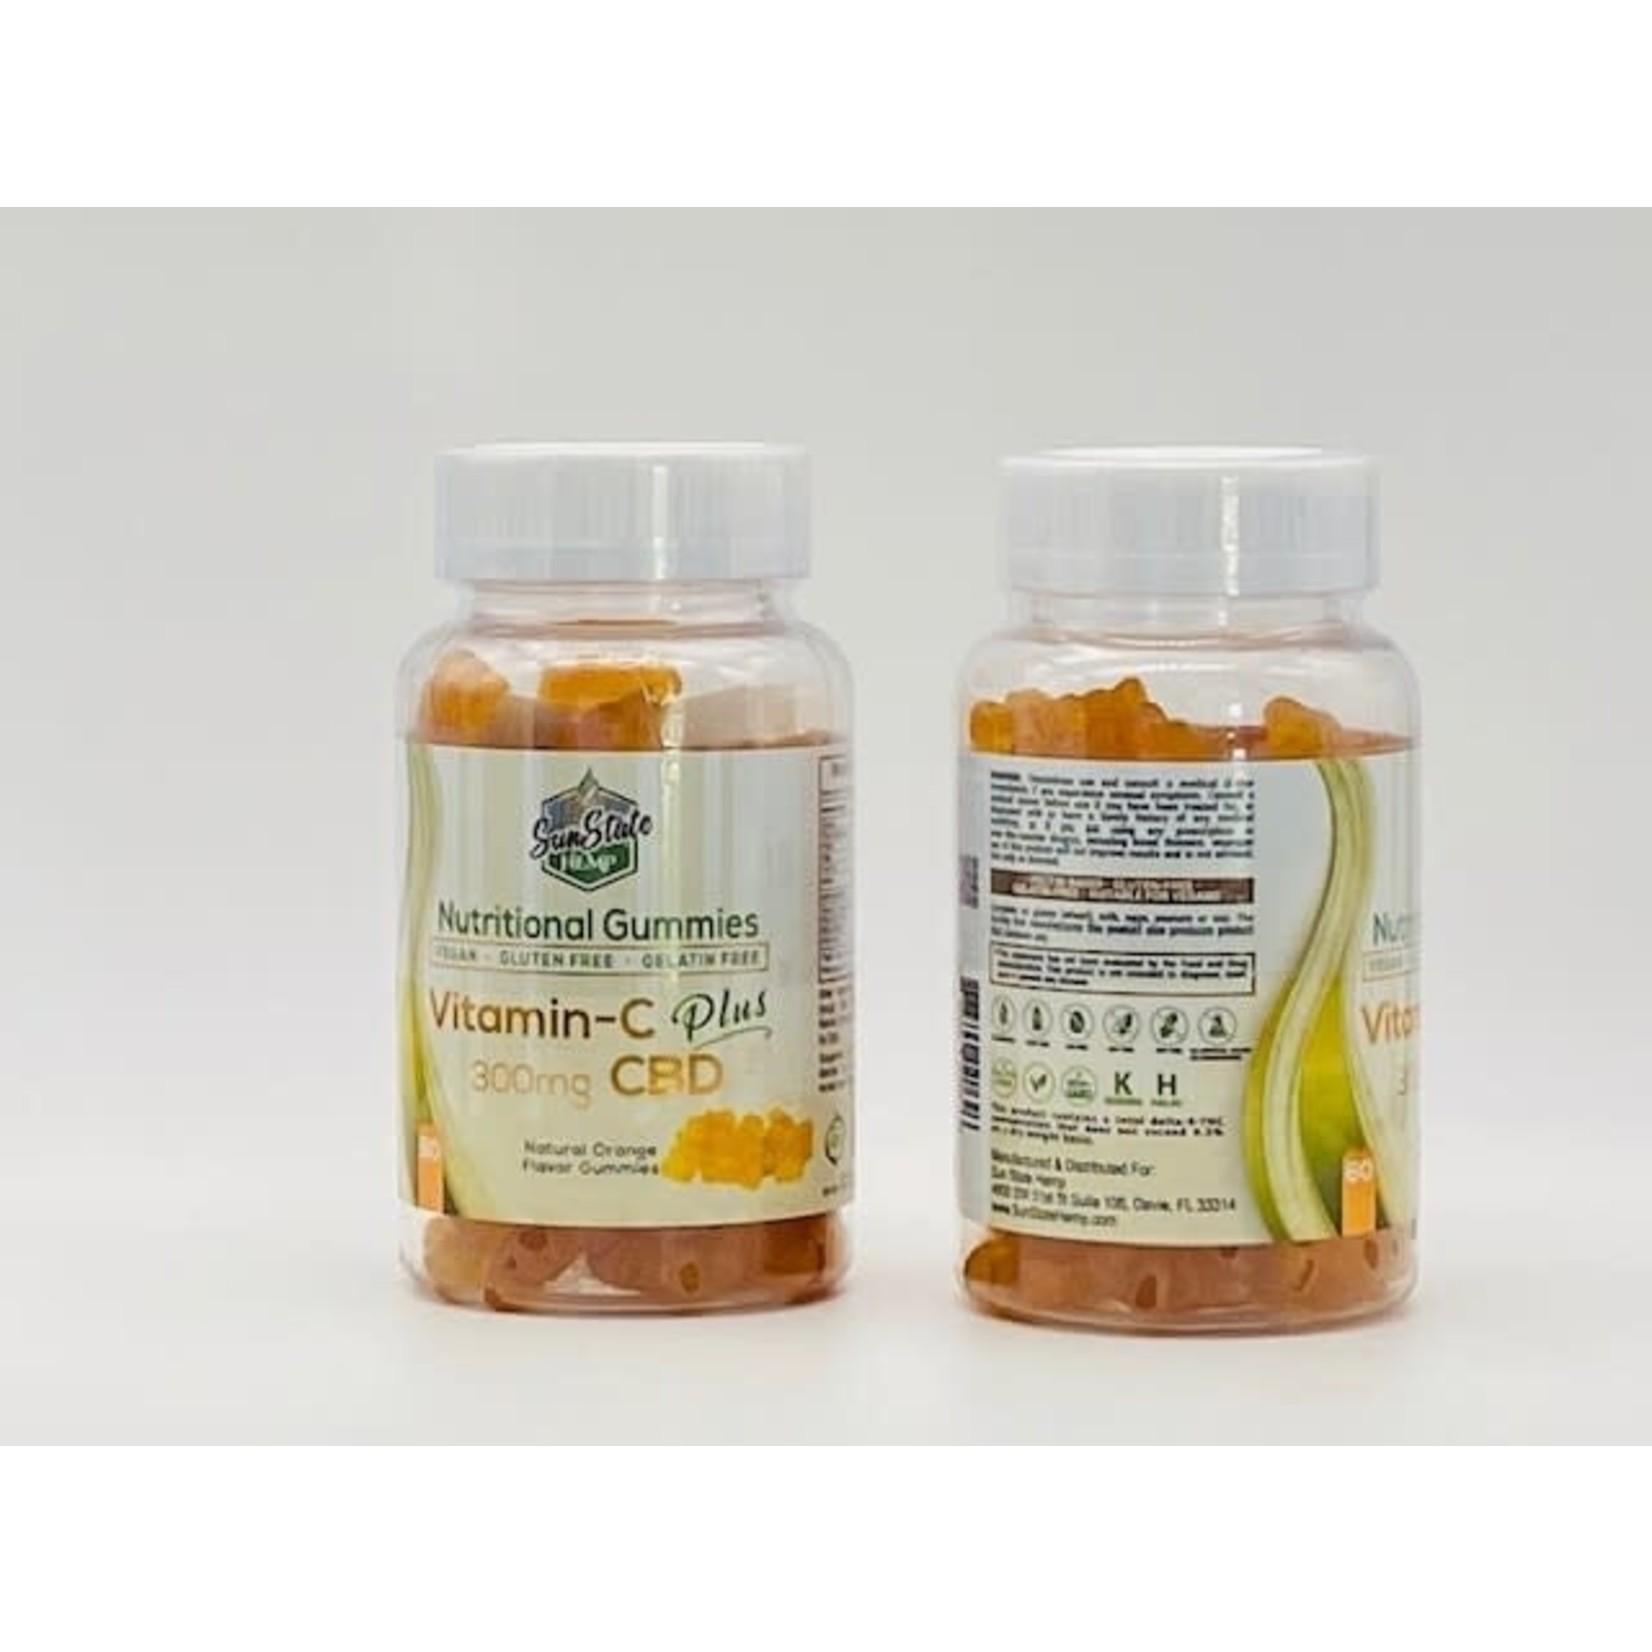 Sun State Hemp SSH CBD Vitamin C Plus Orange 300mg